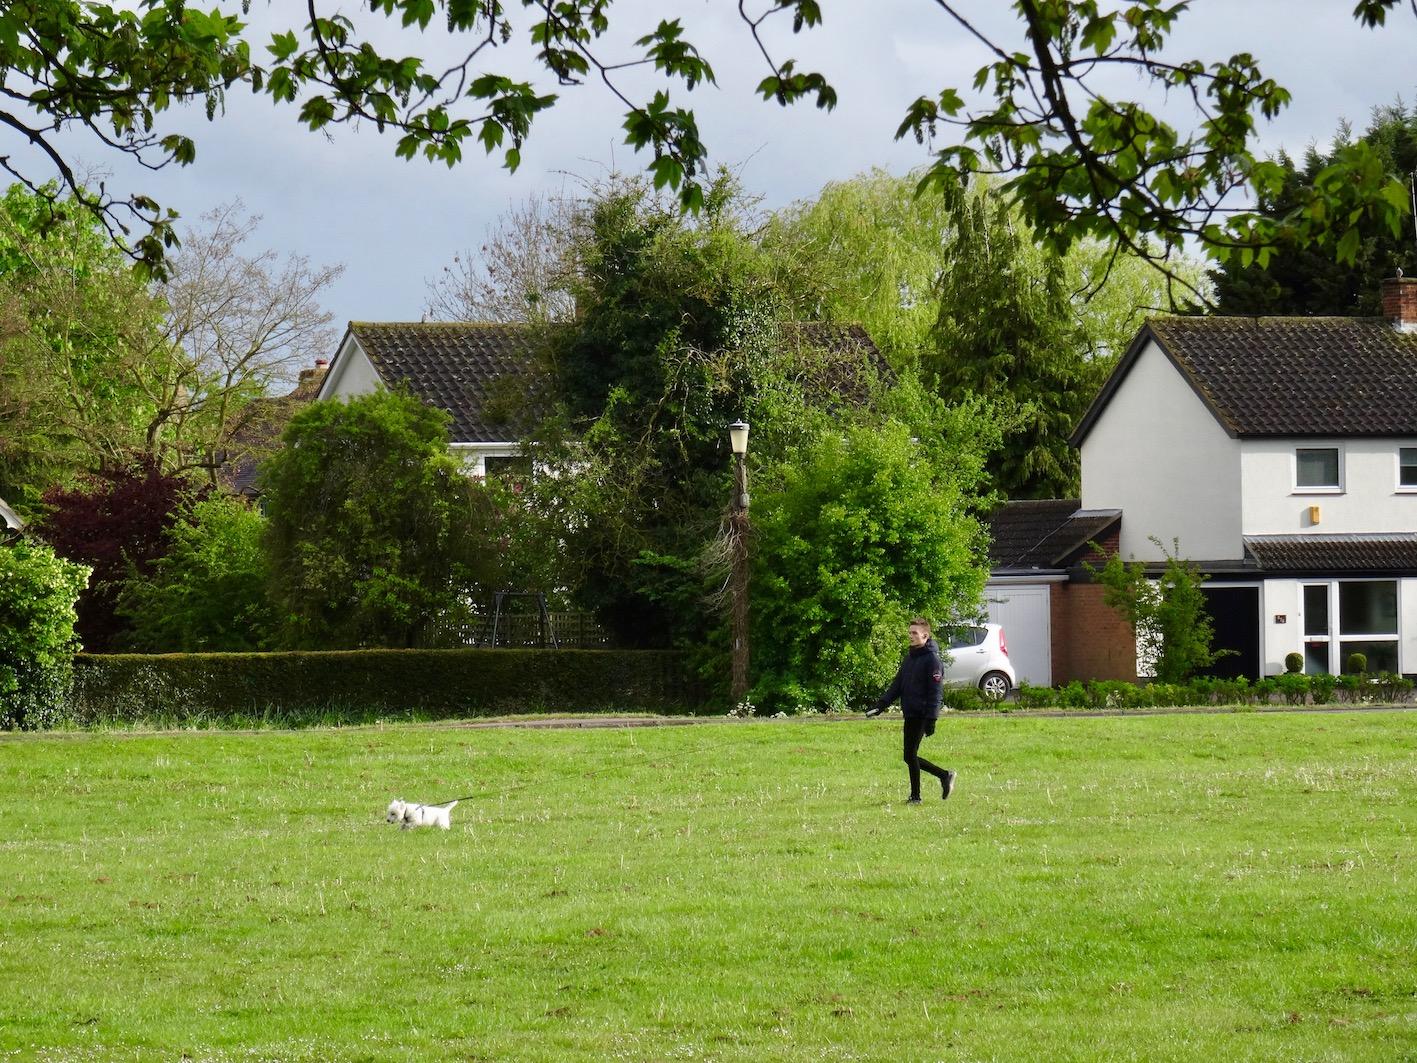 Barrington Village Green Cambridgeshire England.